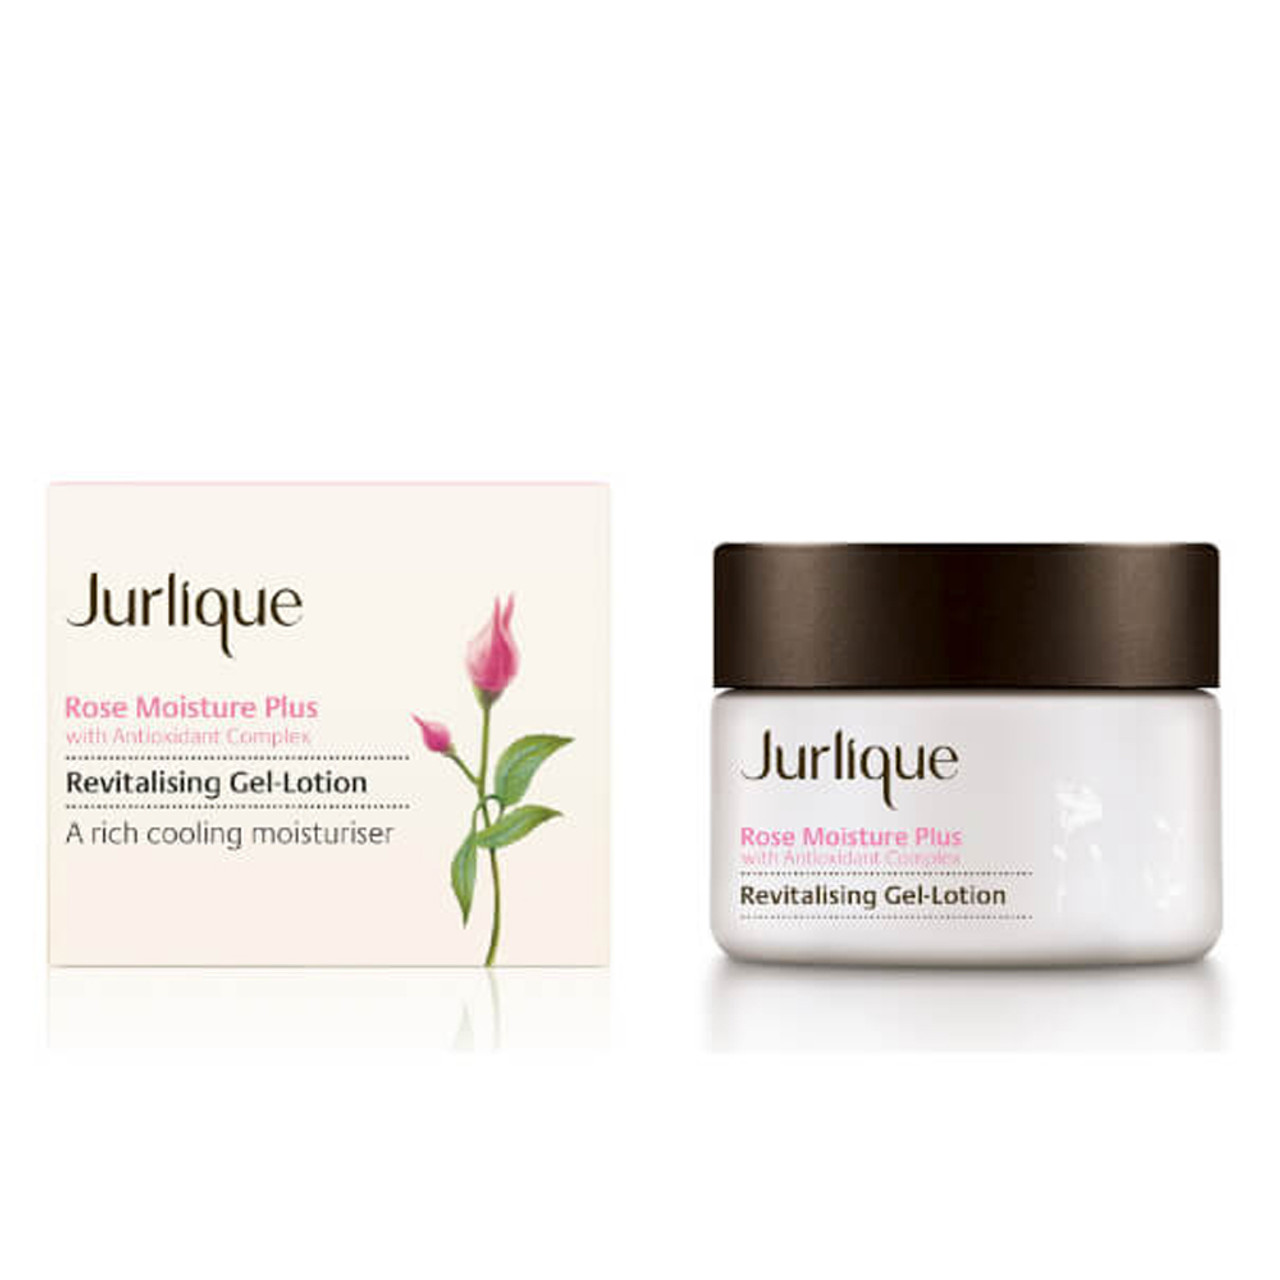 Jurlique Rose Moisture Plus Revitalising Gel Lotion(discontinued) BeautifiedYou.com